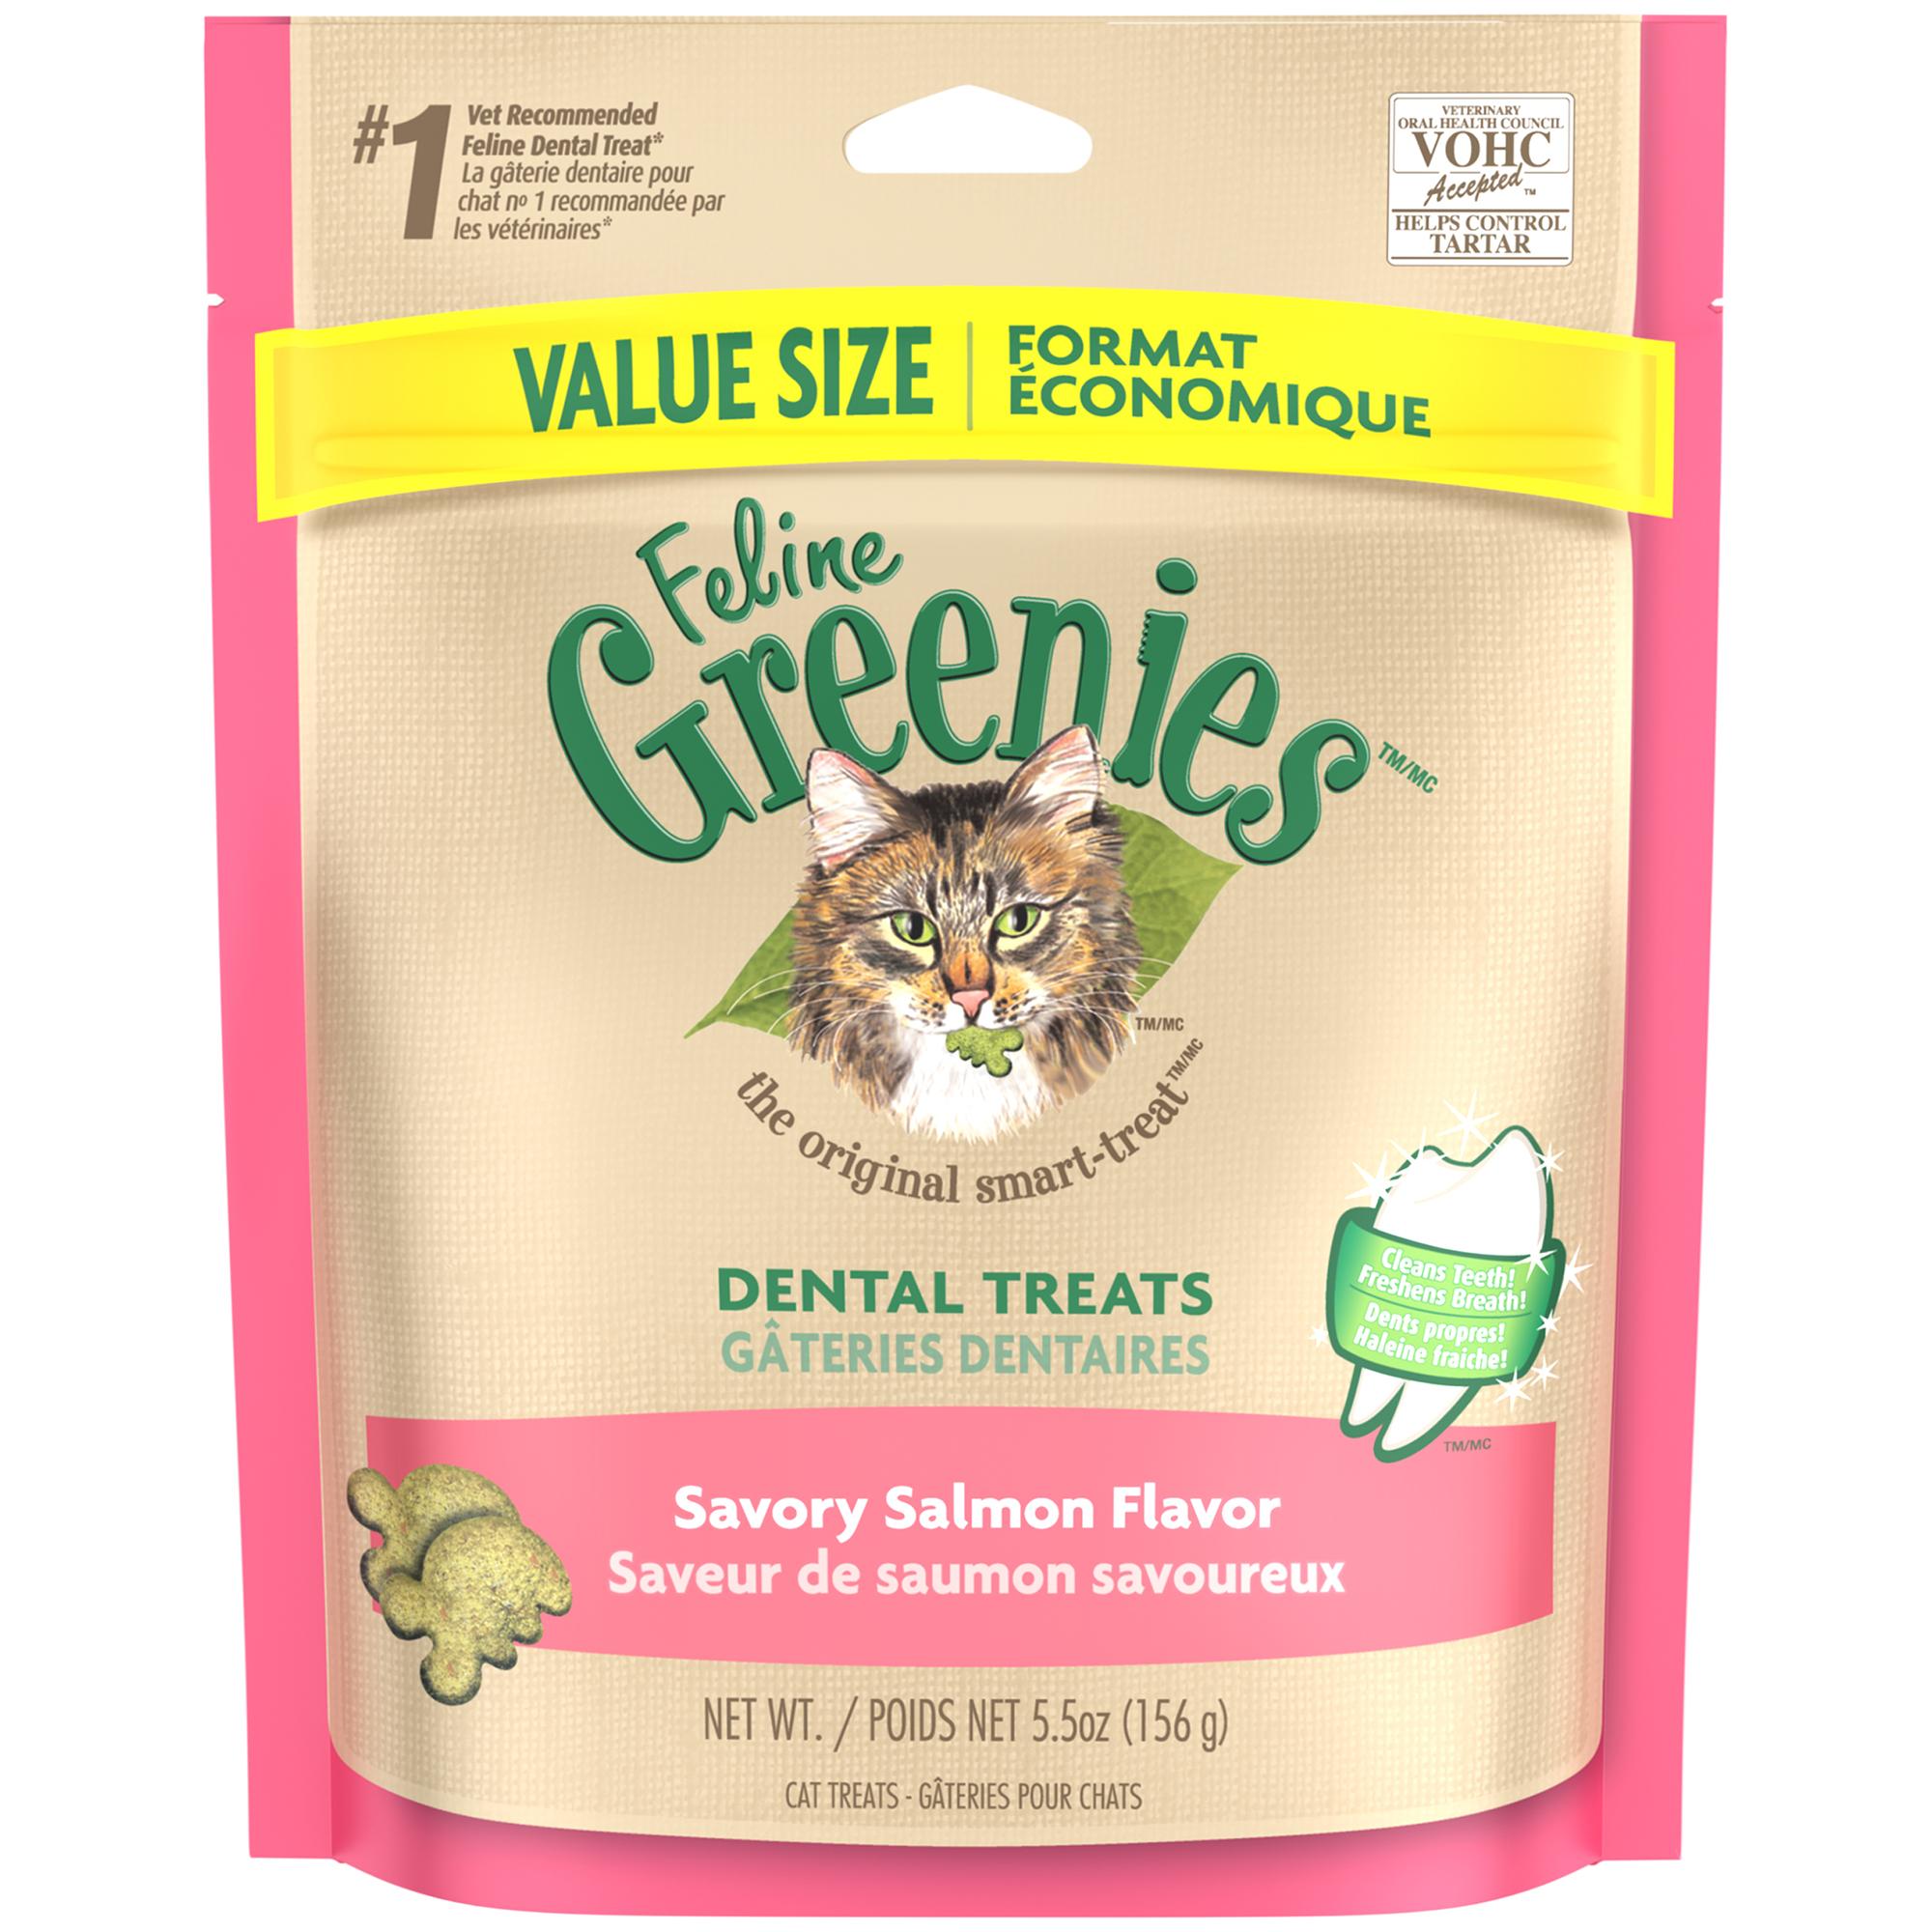 FELINE GREENIES Dental Cat Treats Savory Salmon Flavor, 5.5 oz. Pouch